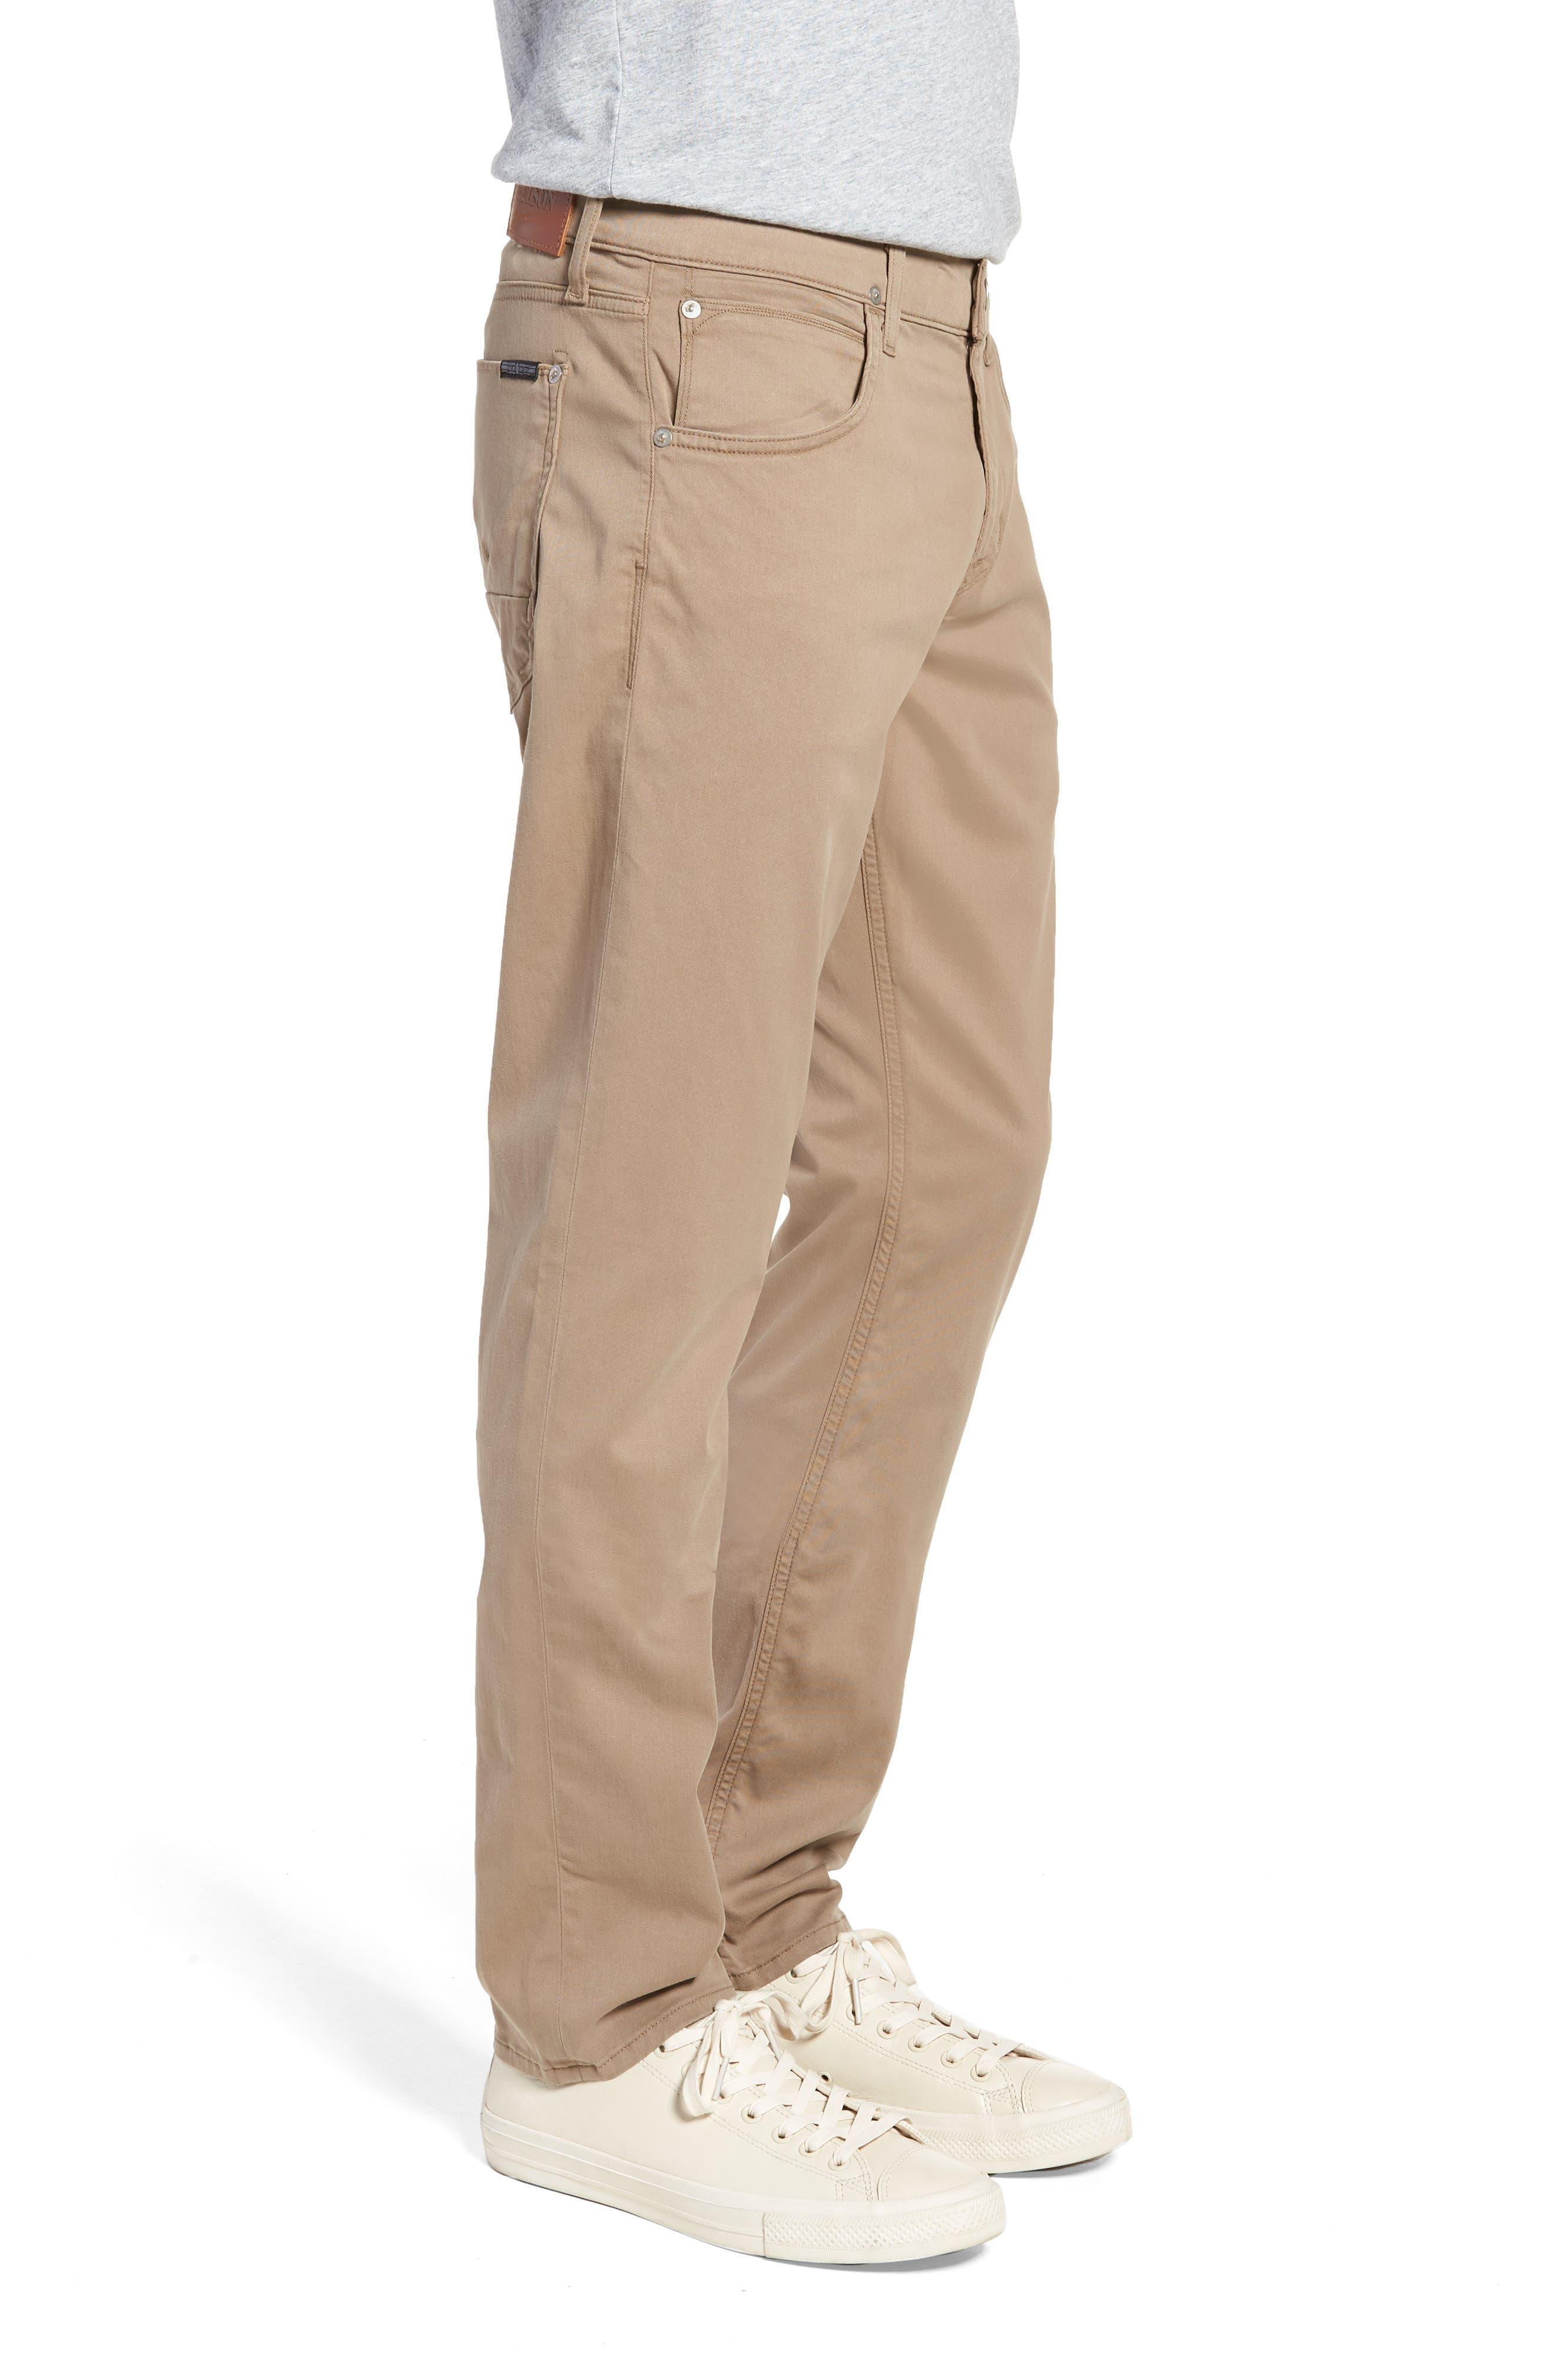 Blake Slim Fit Jeans,                             Alternate thumbnail 3, color,                             Sandman